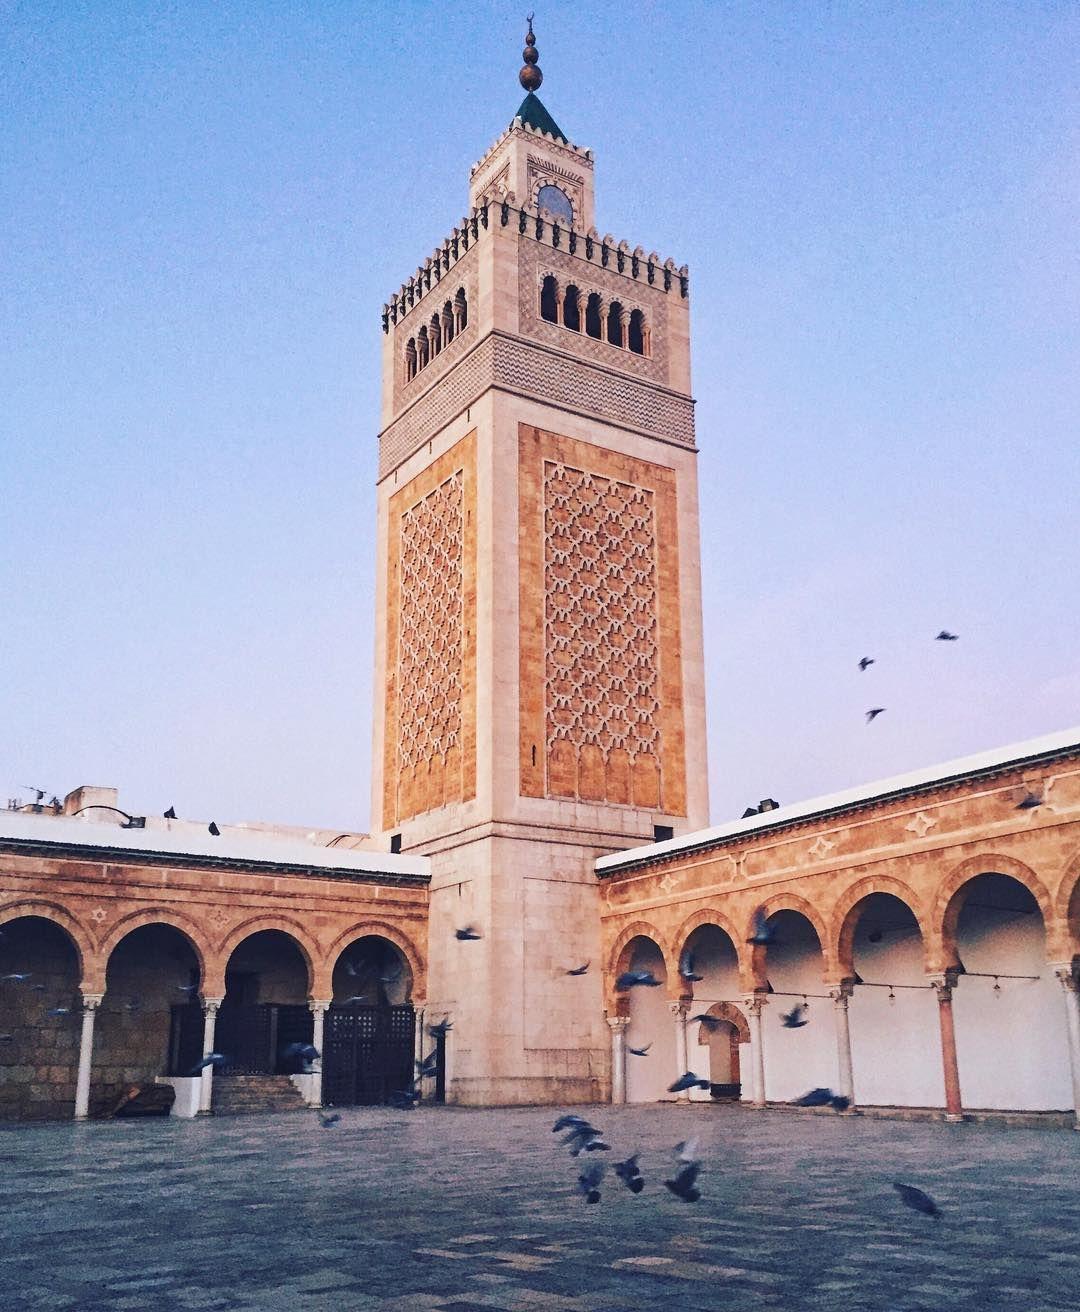 El Zaytouna Mosque Tunis Tunisia Ferry Building San Francisco Tunis Mosque